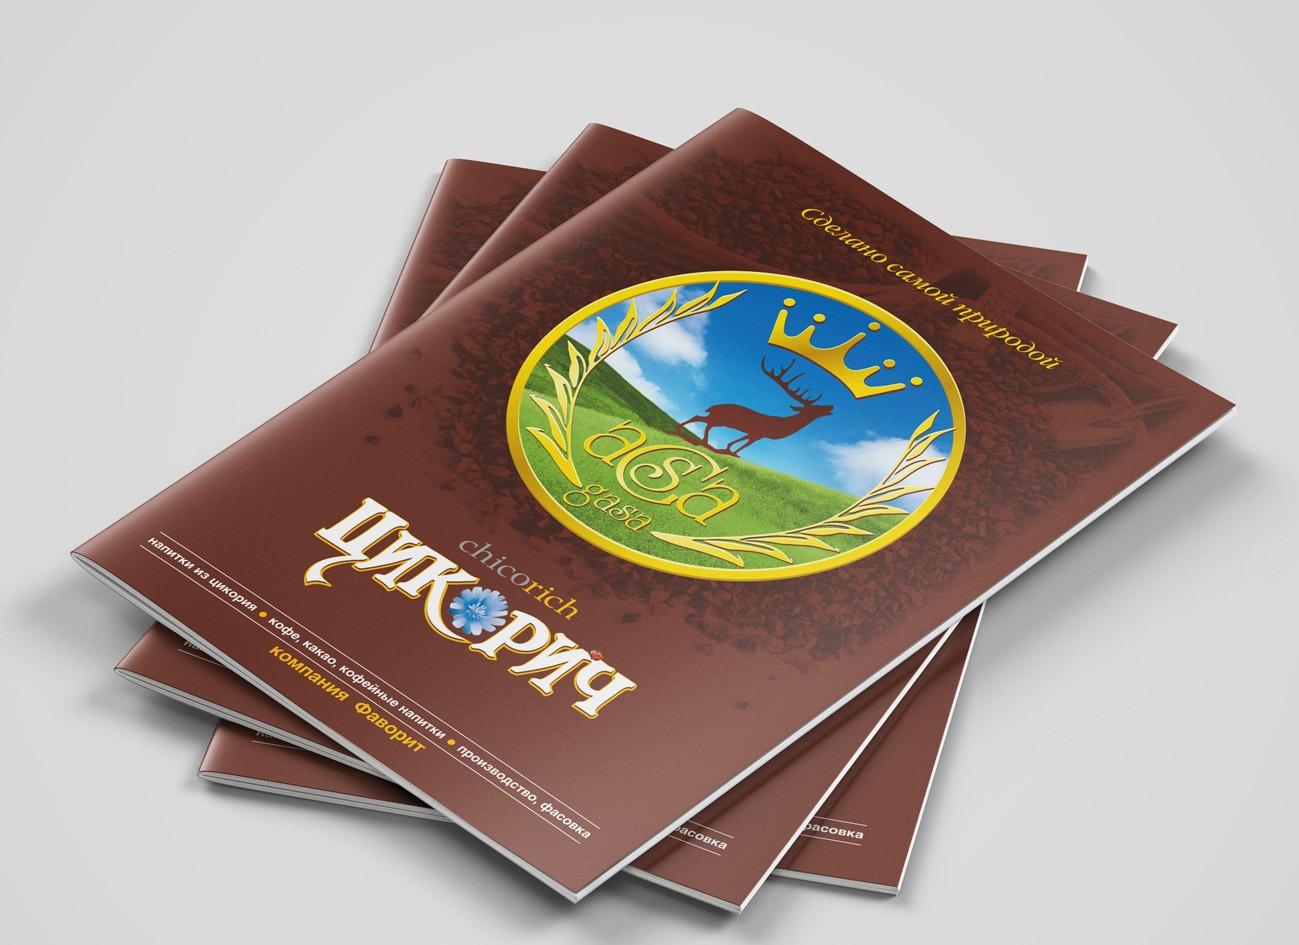 дизайн каталога Цикорич